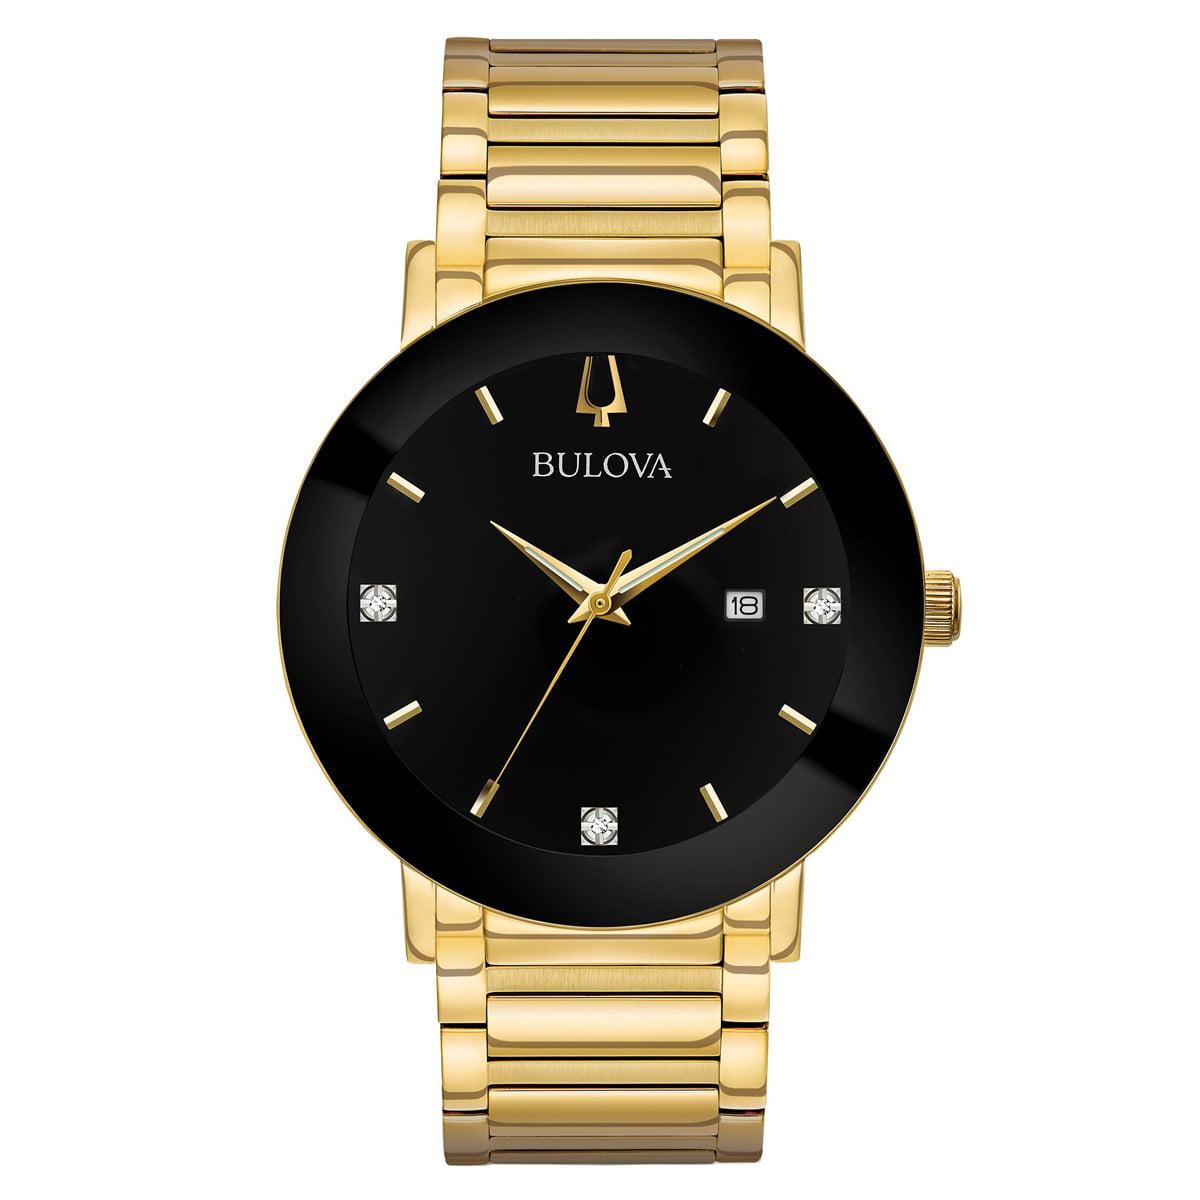 97D116 Men's Modern Black Dial Yellow Gold Steel Bracelet Diamond Watch